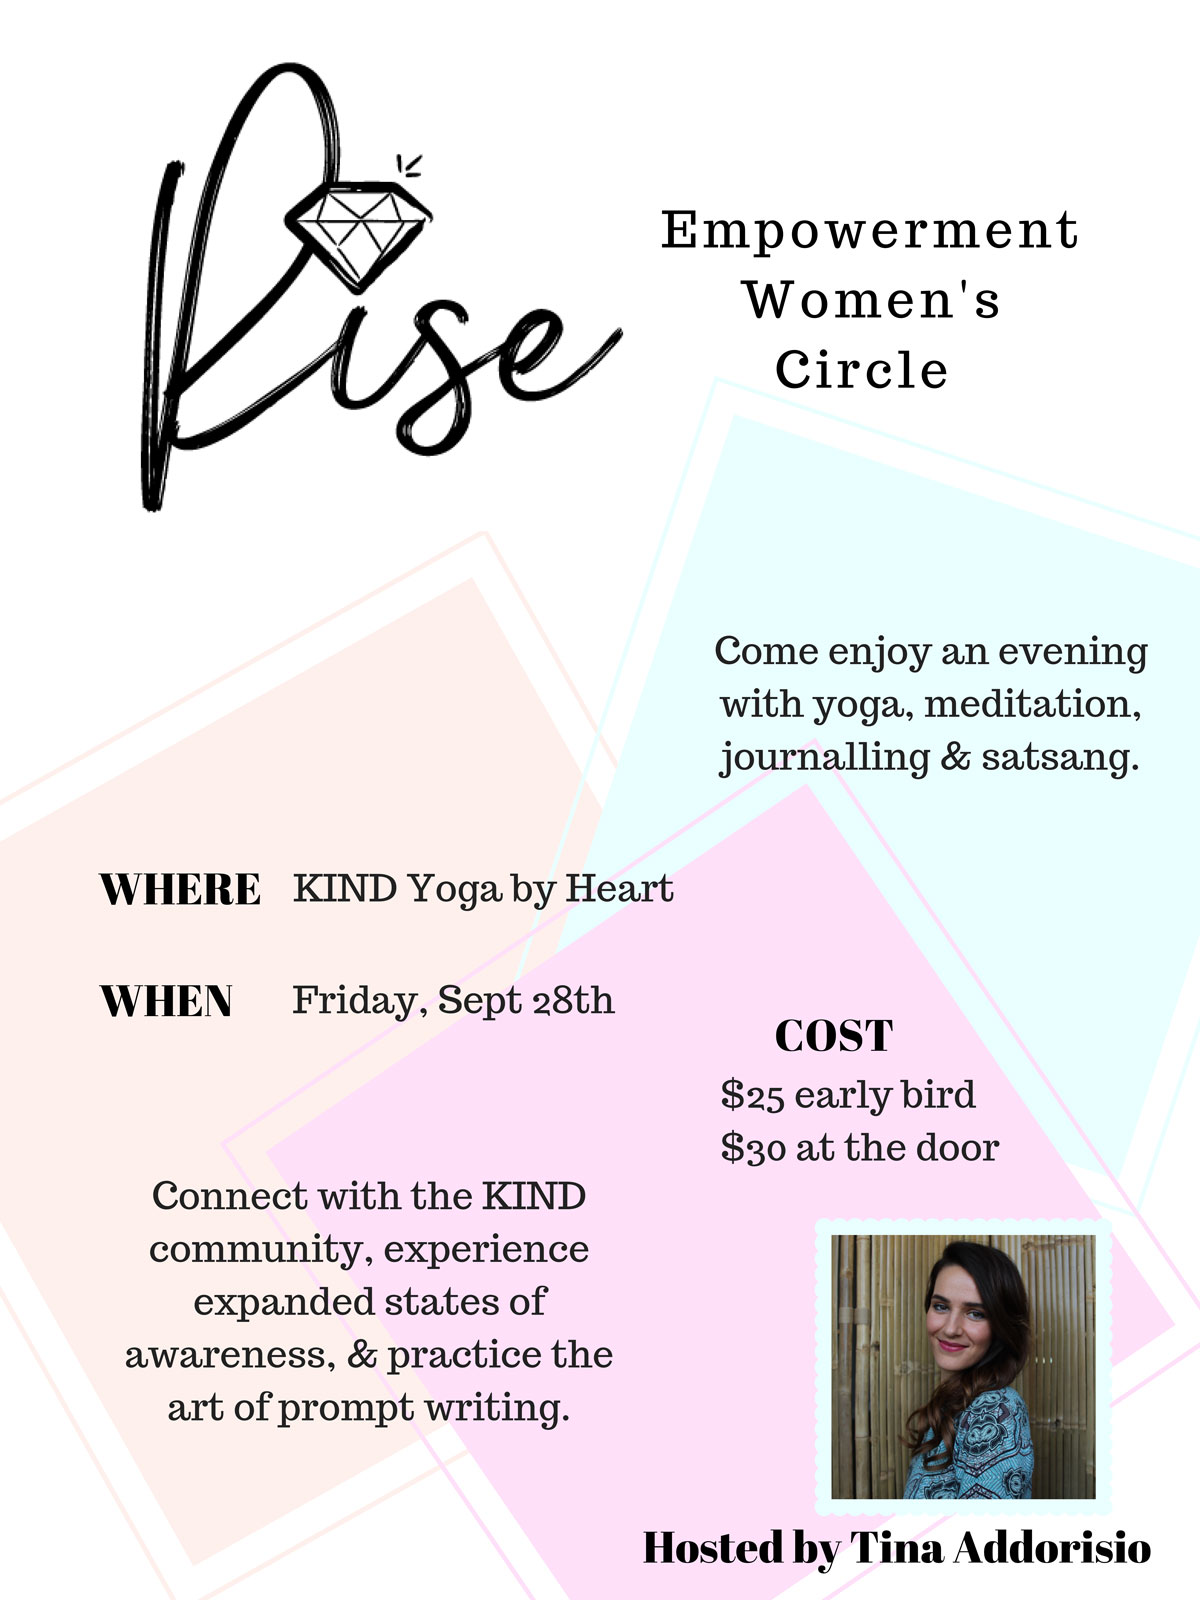 KIND-Rise-Empowerment-Poster.jpg